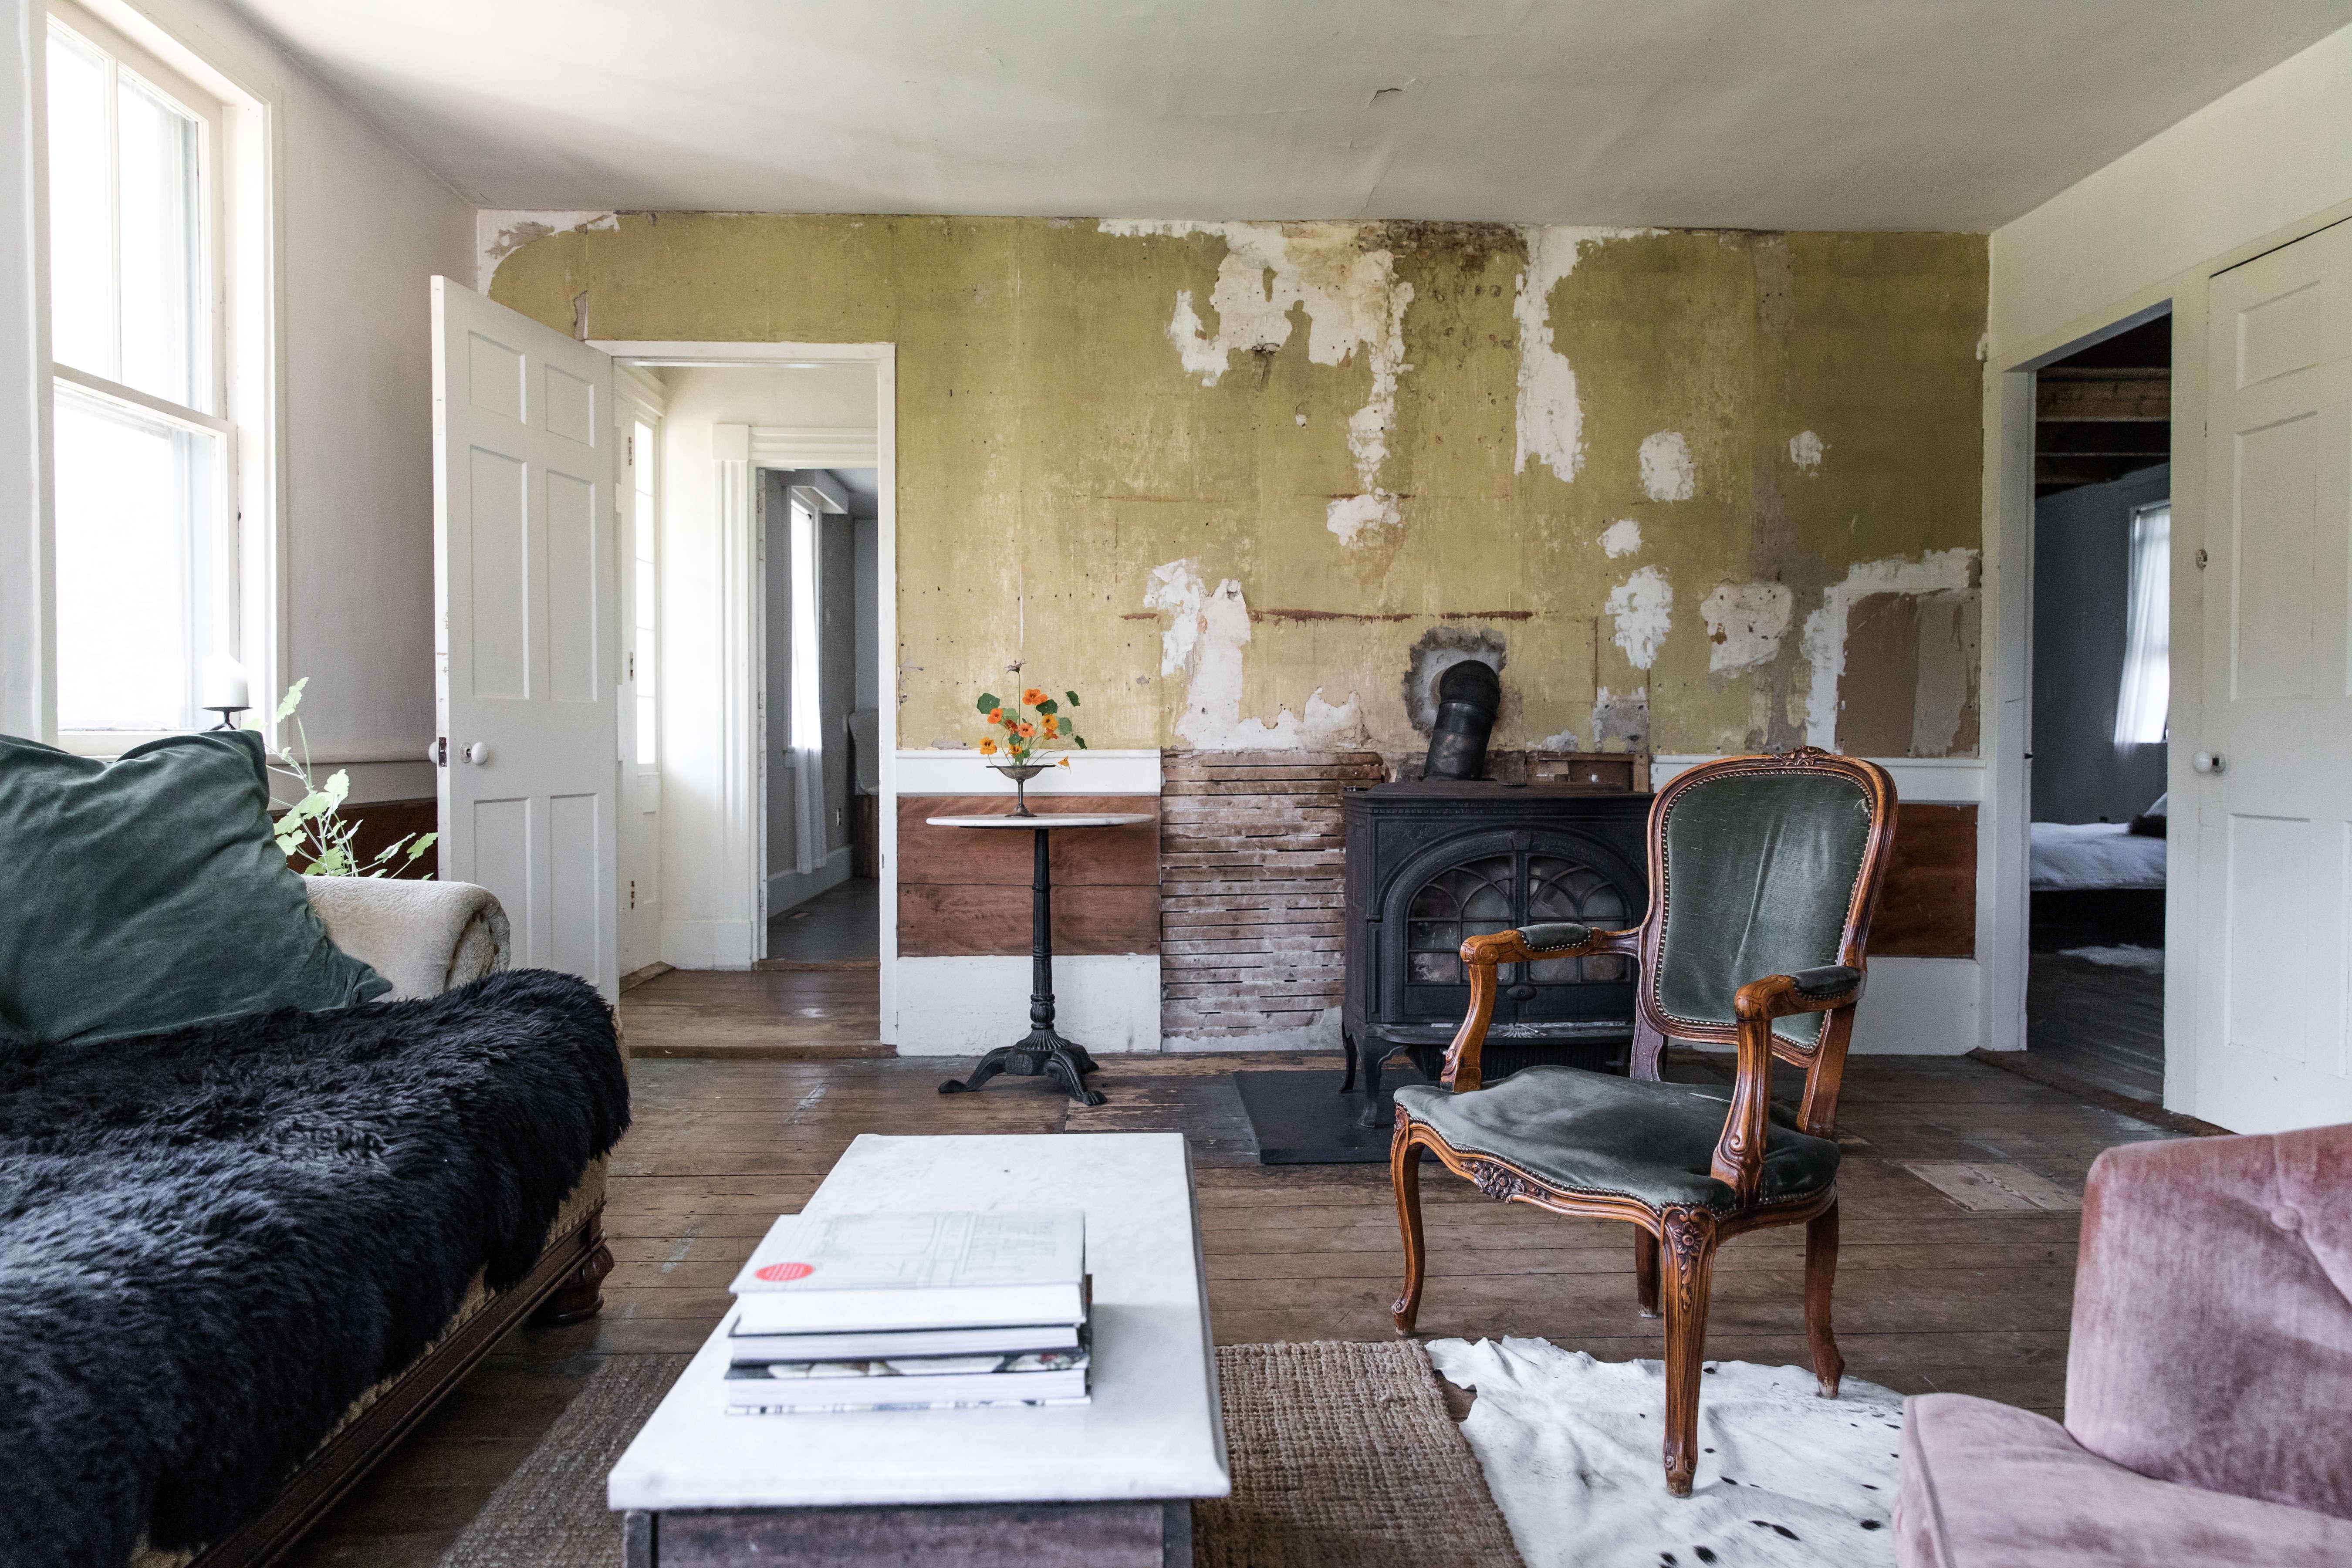 The House That Craigslist Built A Bare Bones Farmhouse In Midcoast Maine